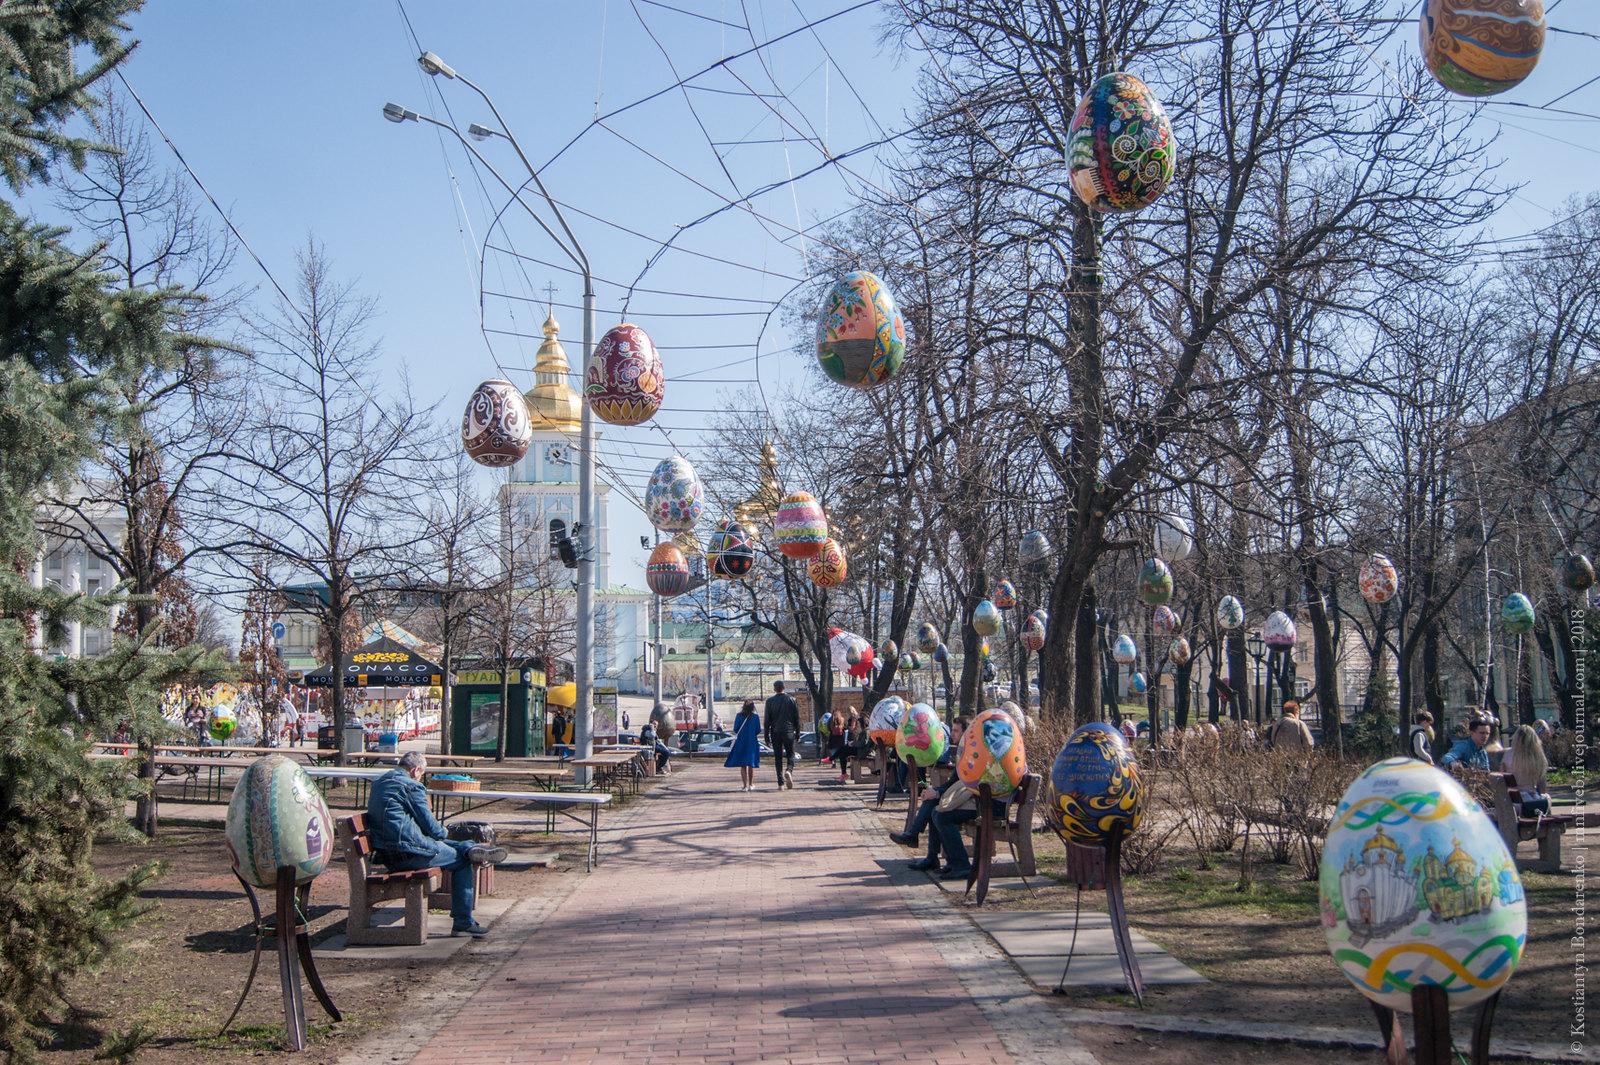 201804010 - Easter-31